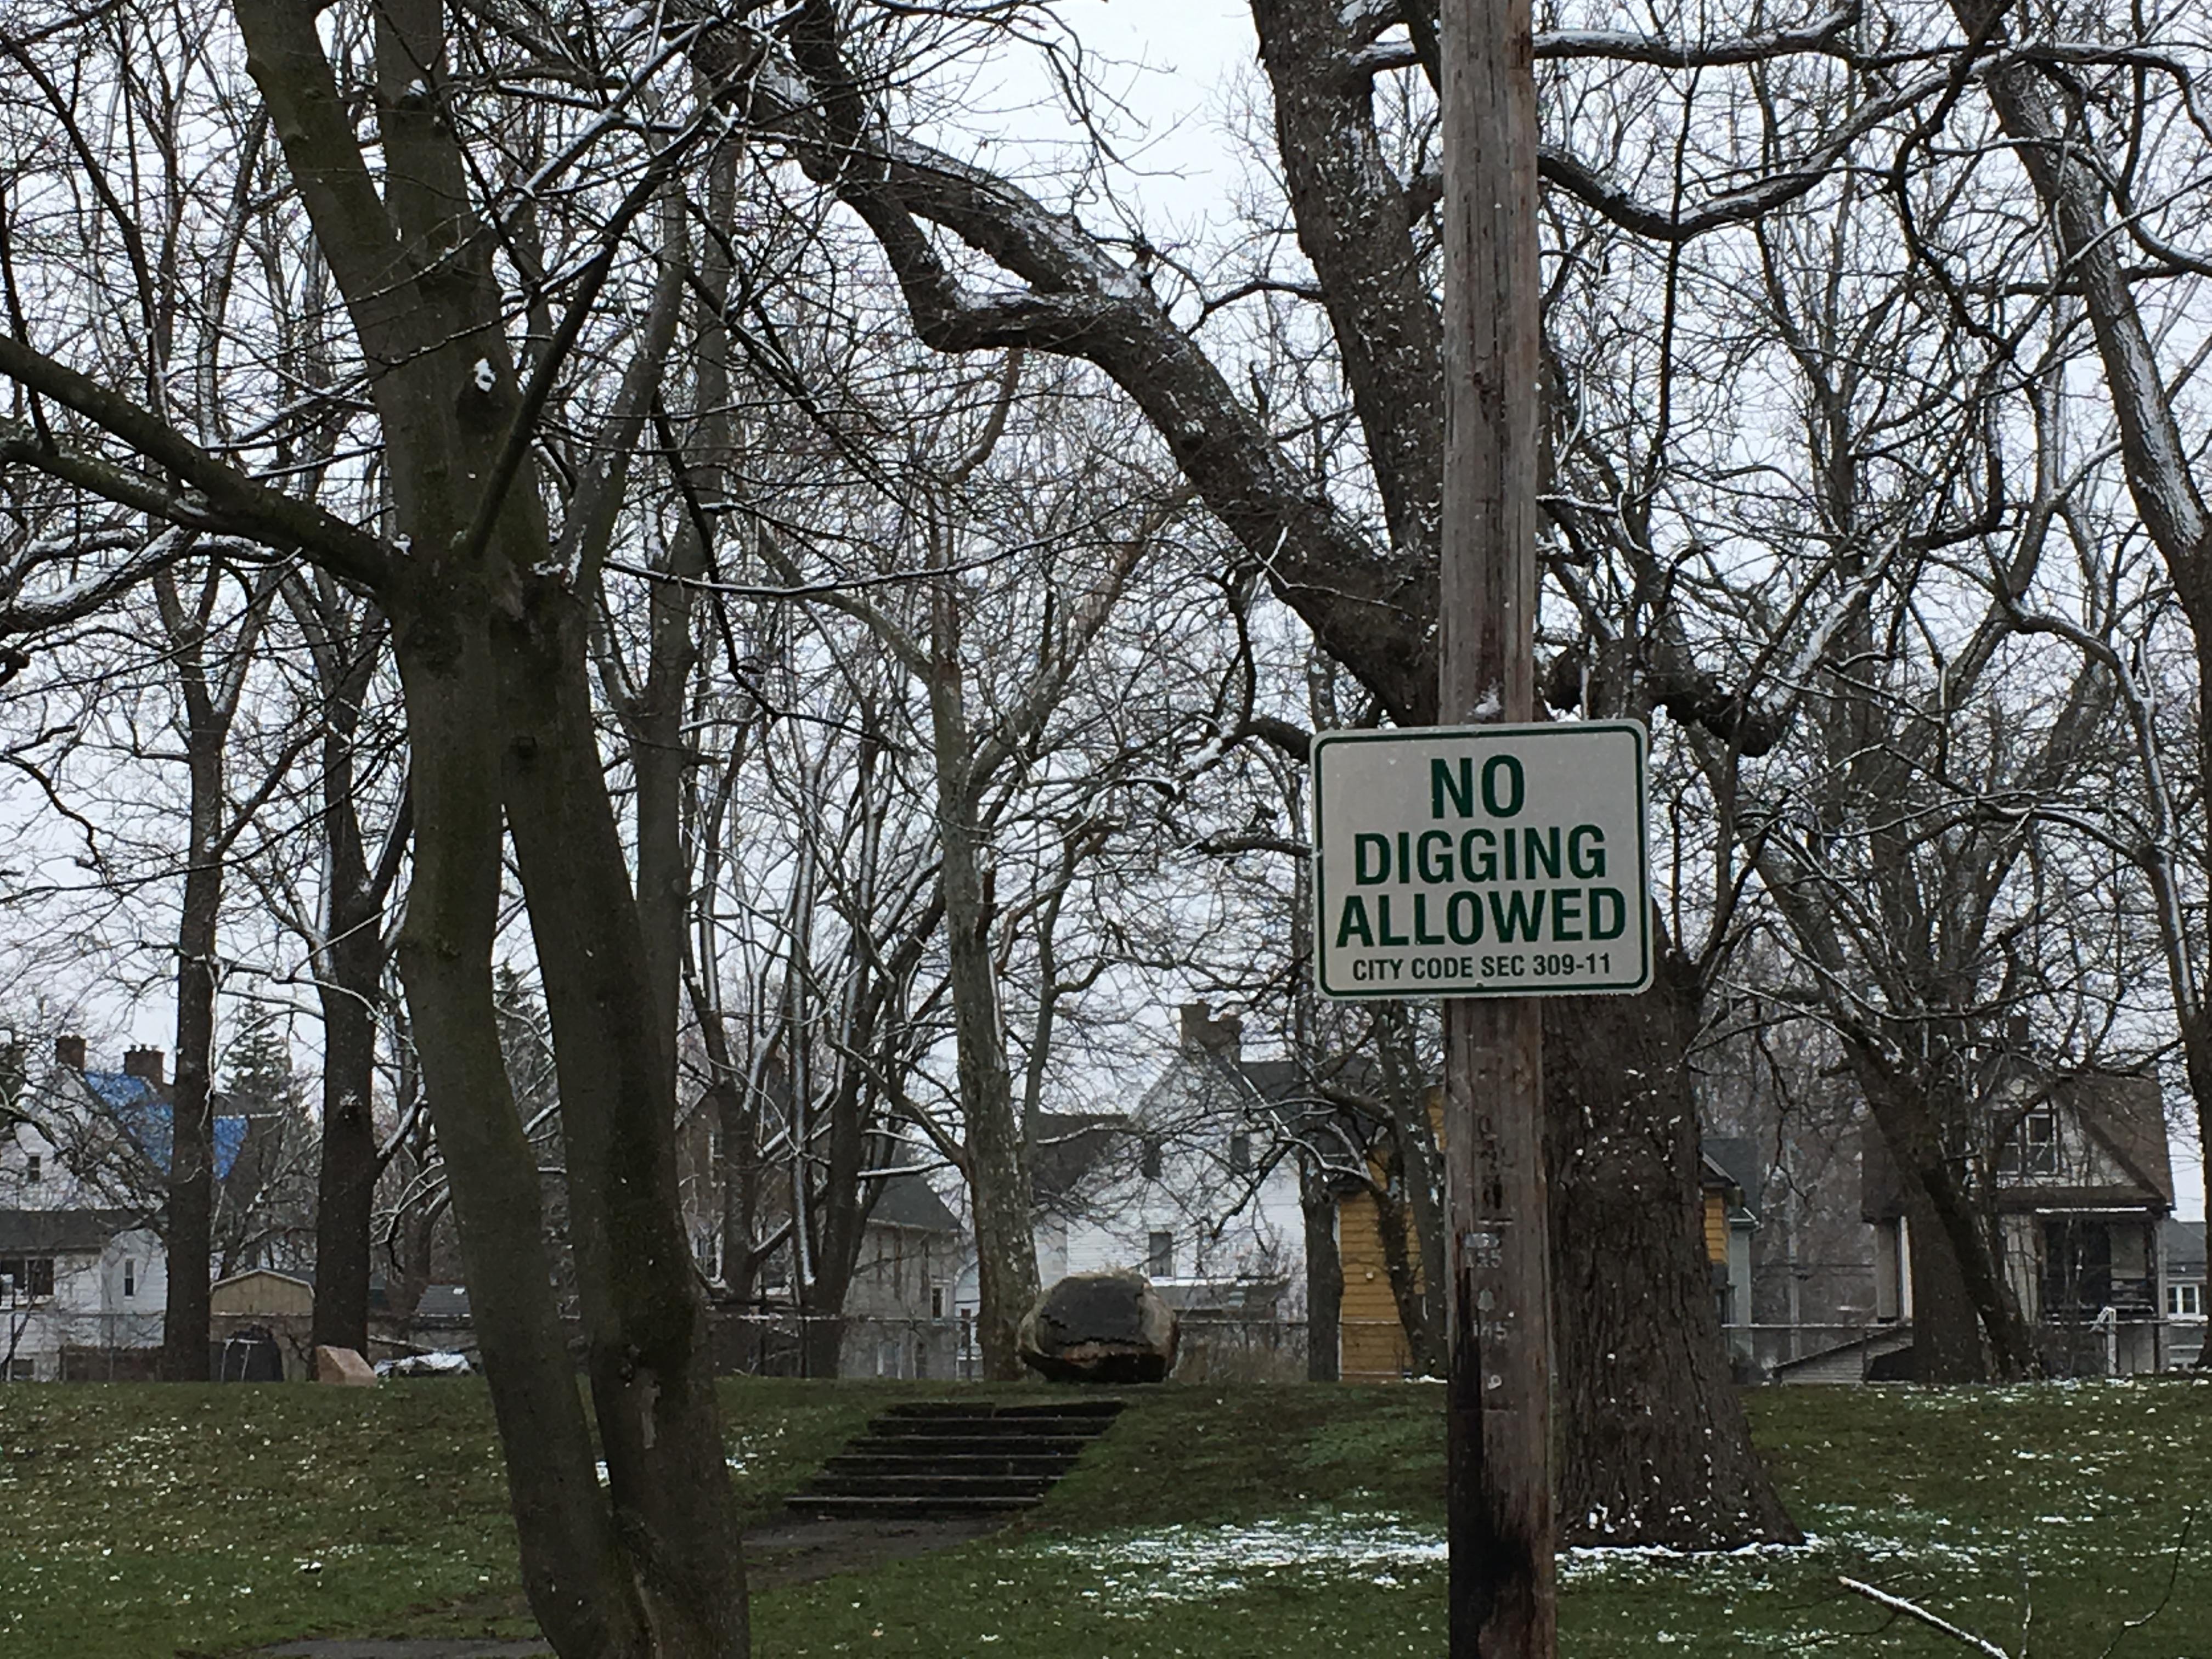 Seneca Indian Park - Buffum St. NO DIGGING ALLOWED sign 04-01-2021